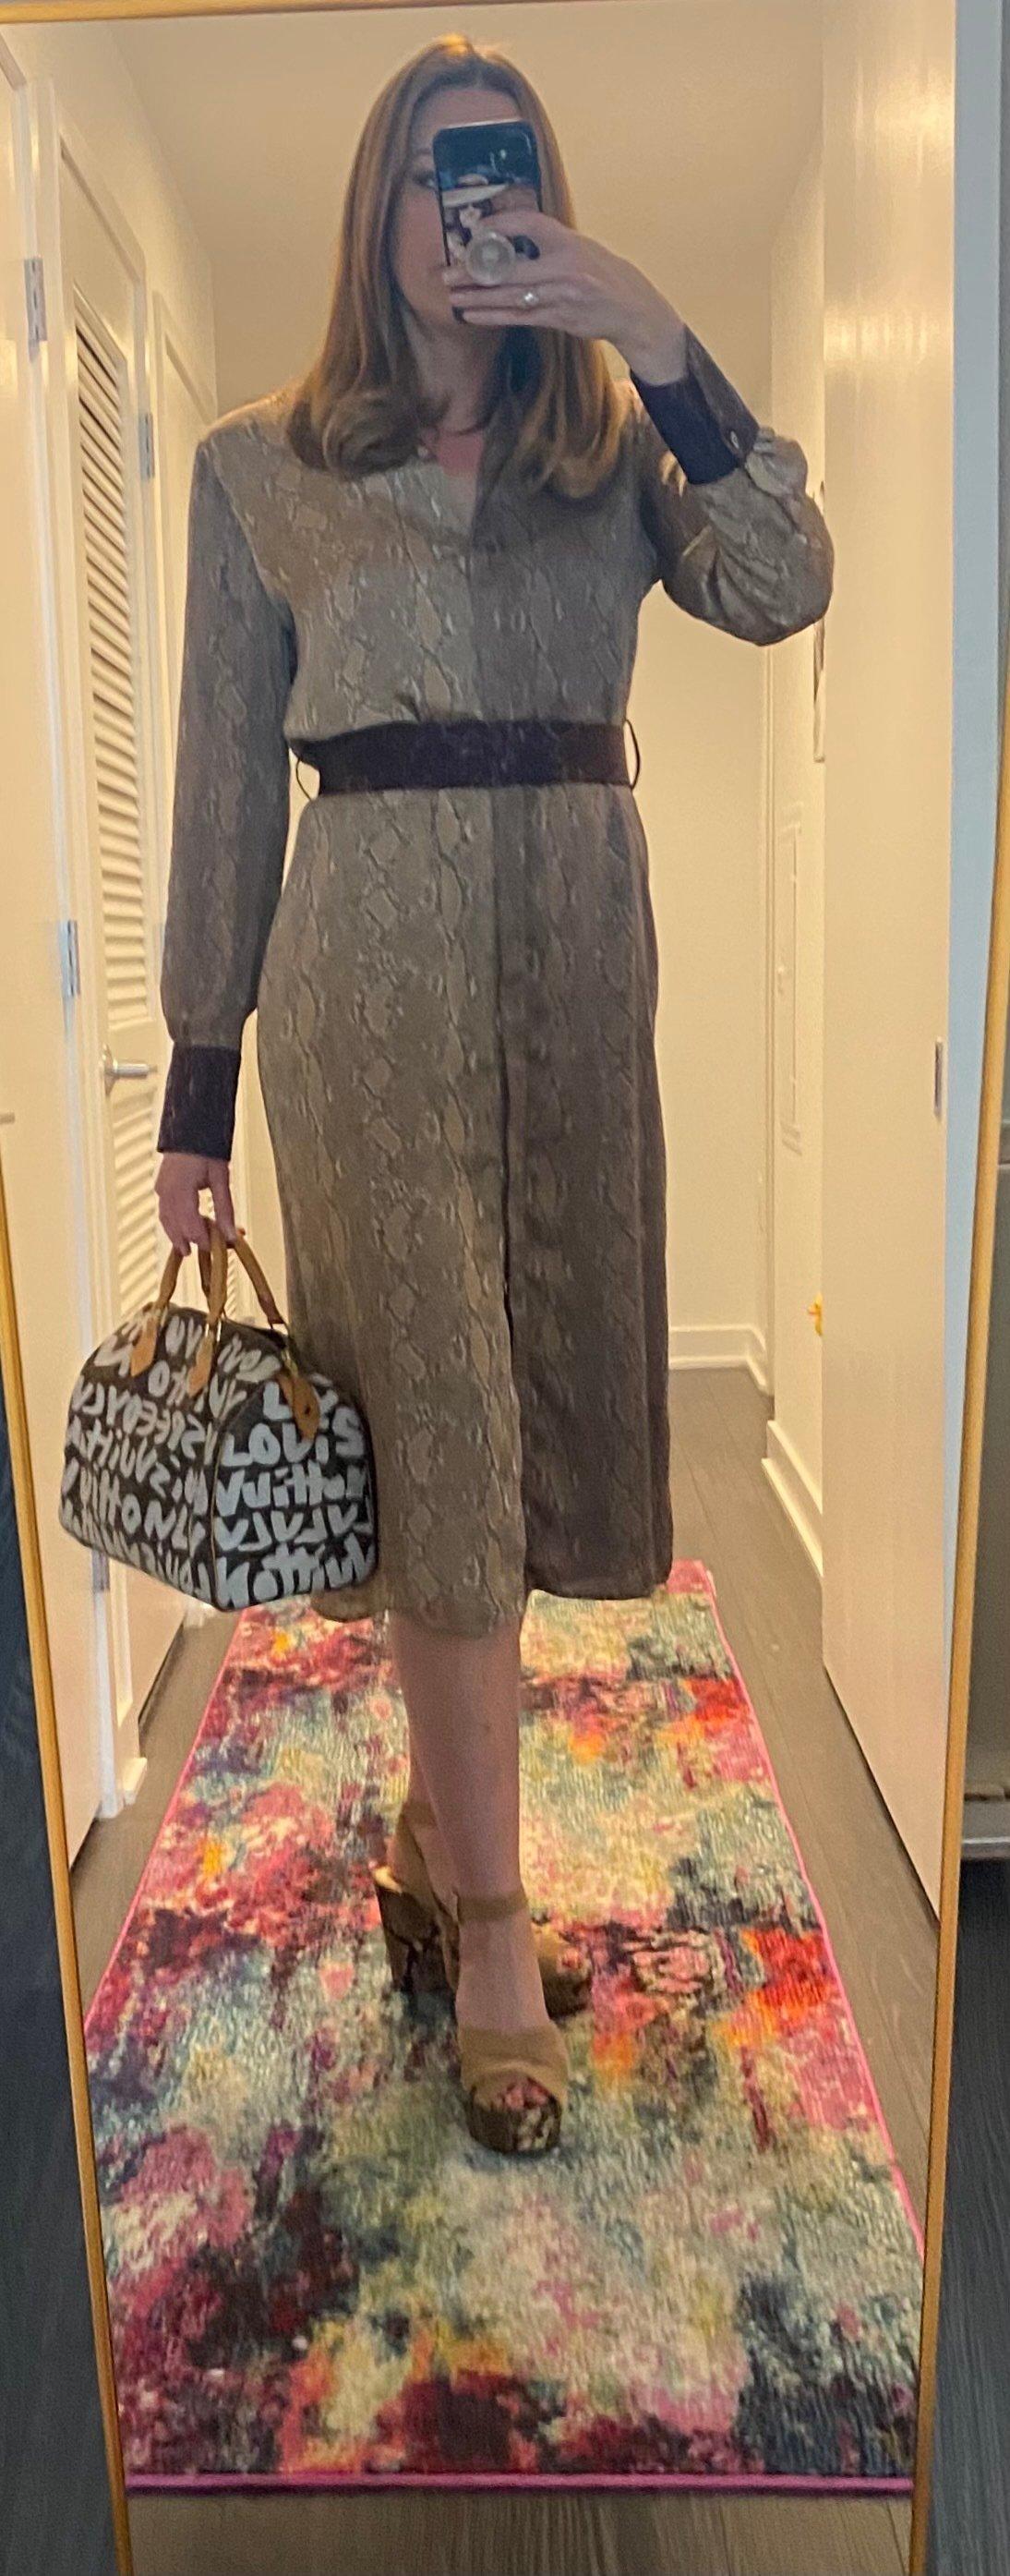 Woman in snake print dress and heels carrying handbag